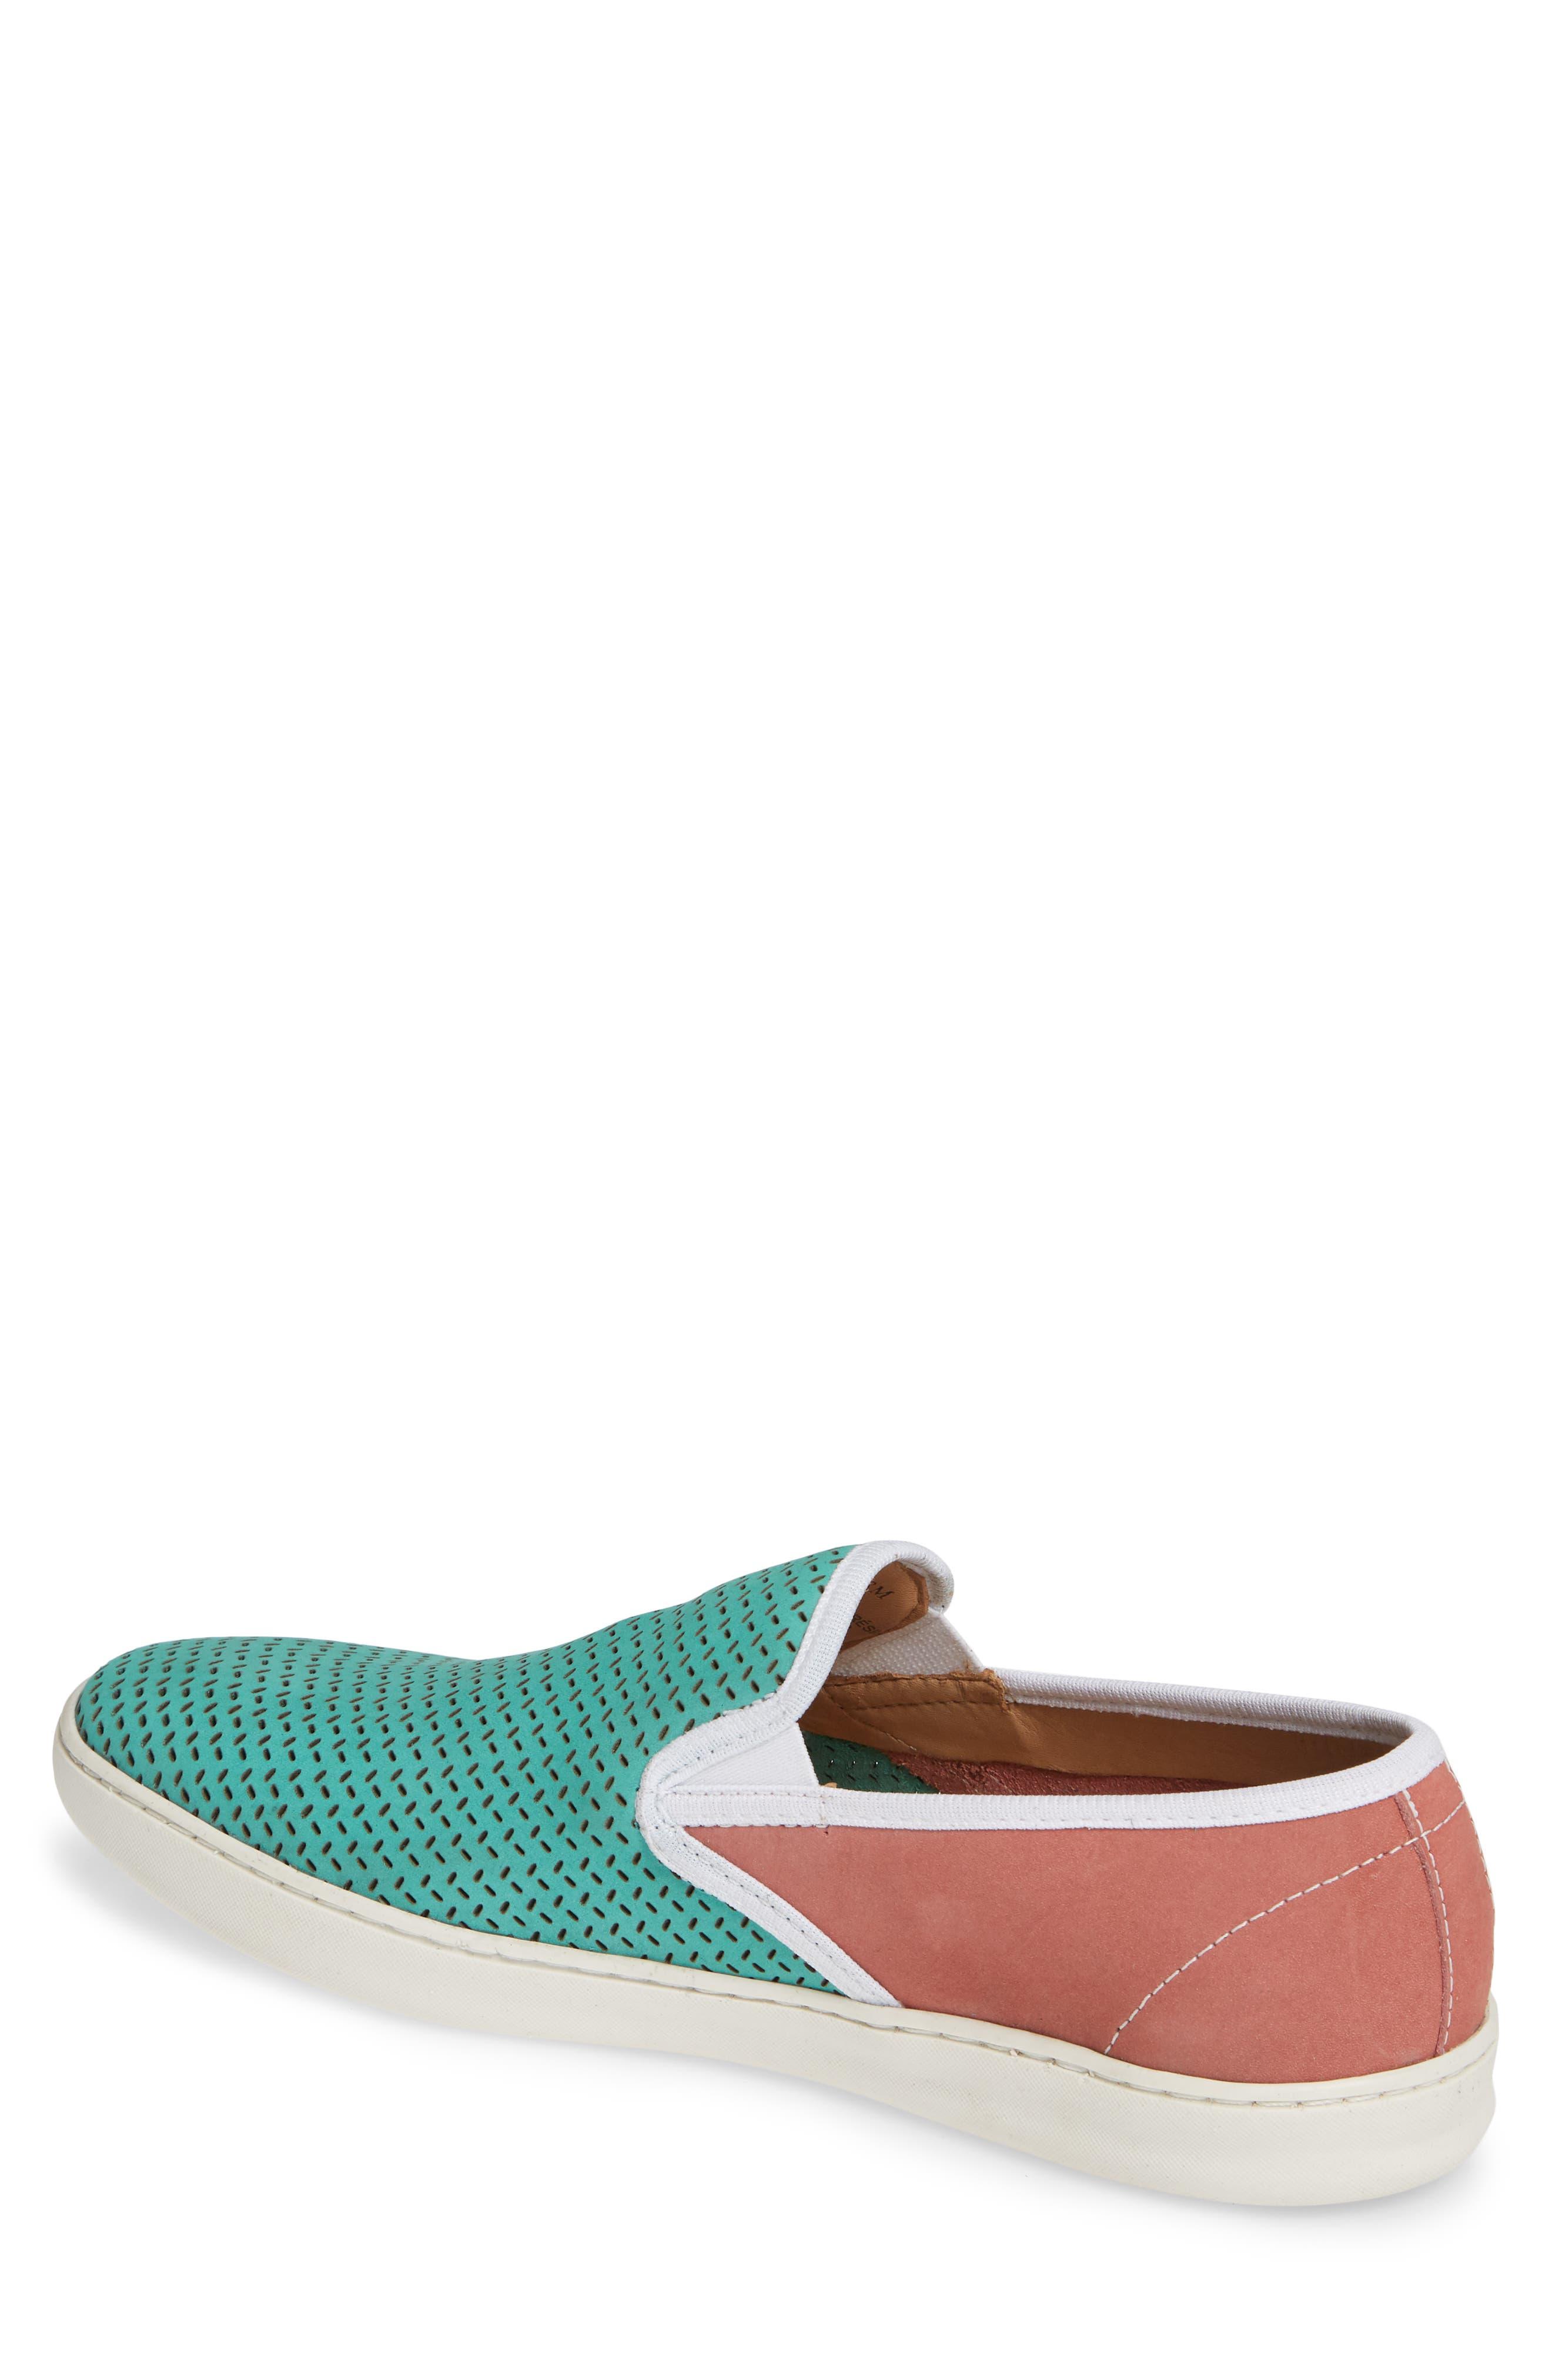 Malibu Perforated Loafer,                             Alternate thumbnail 2, color,                             AQUA/PINK NUBUCK